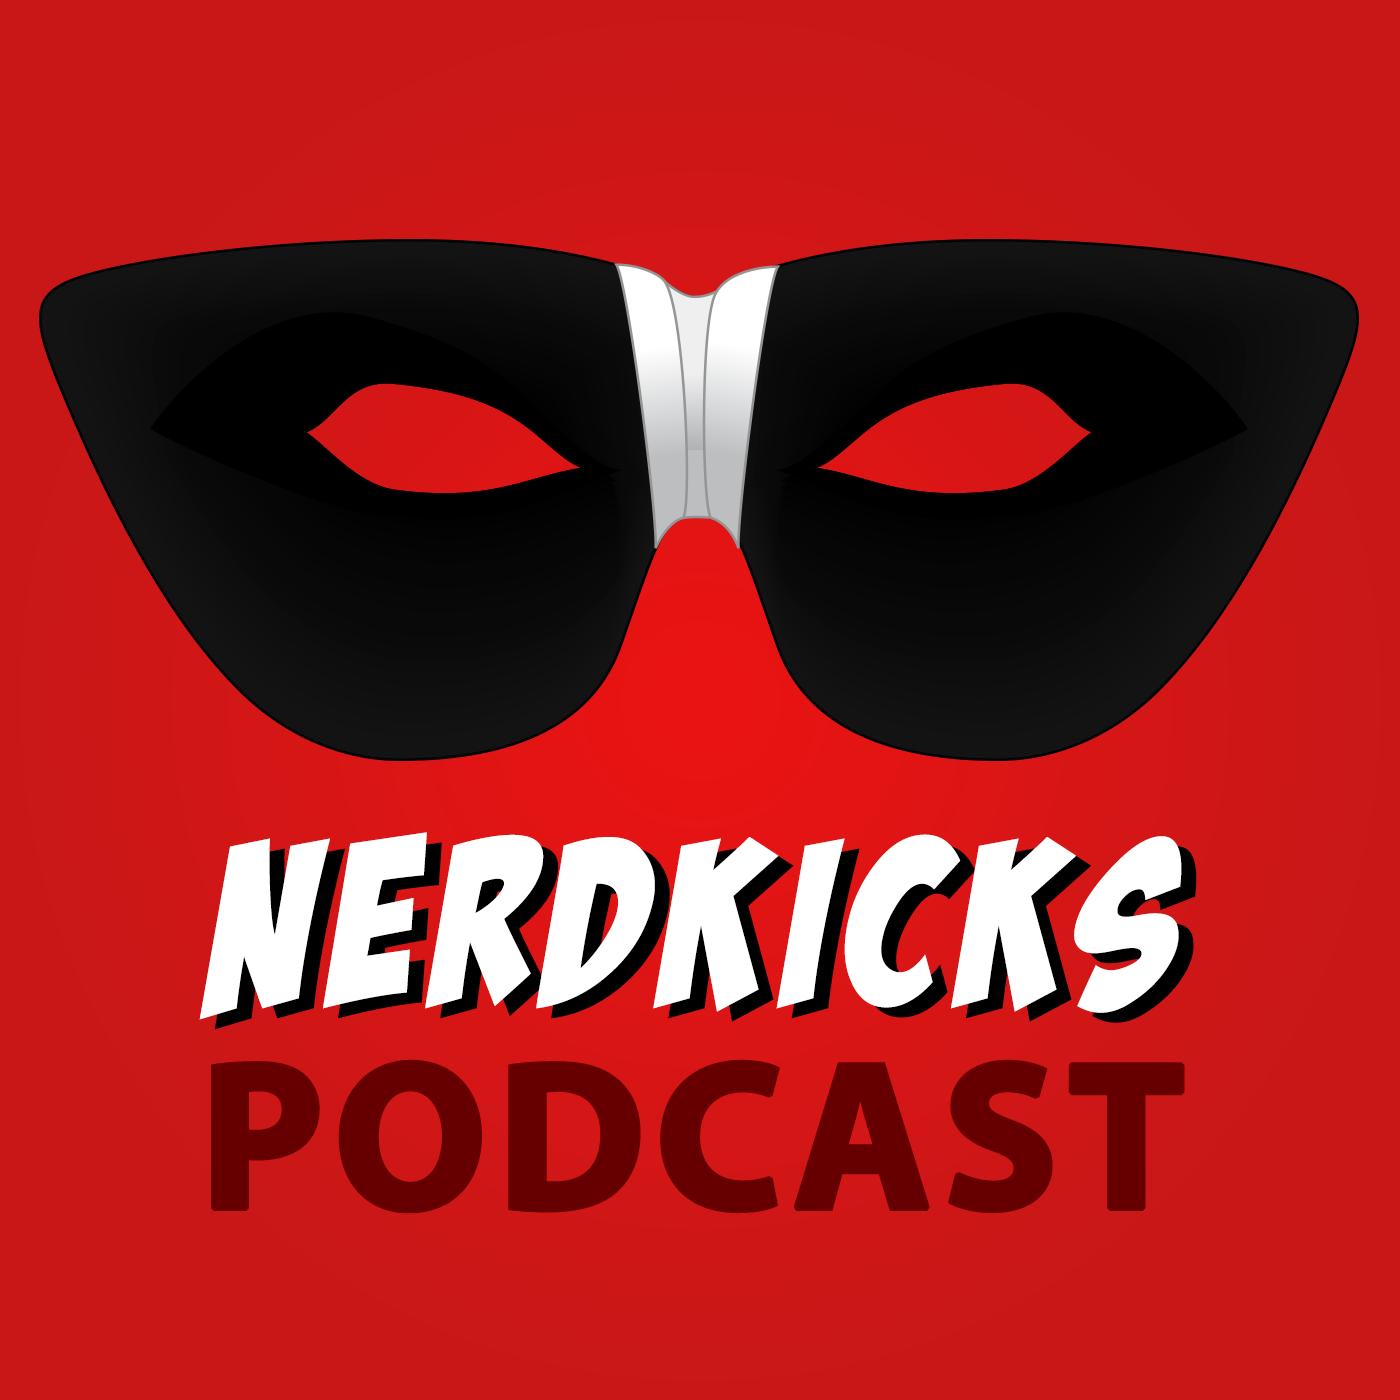 NerdKicks Podcast